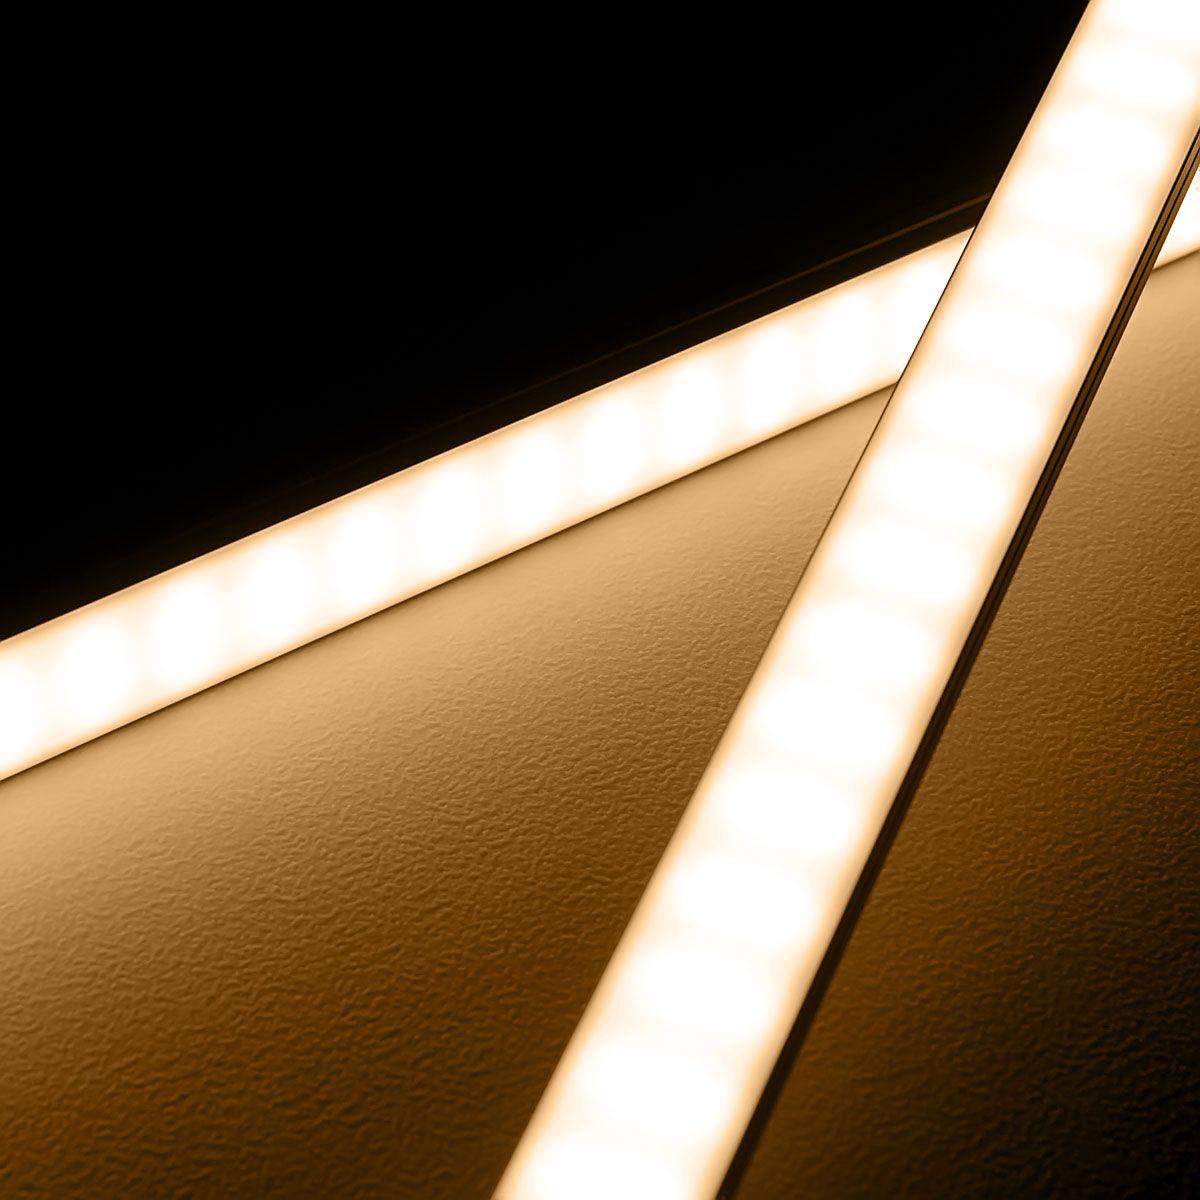 24V High-Power Aluminium LED Leiste – warmweiß – diffuse Abdeckung